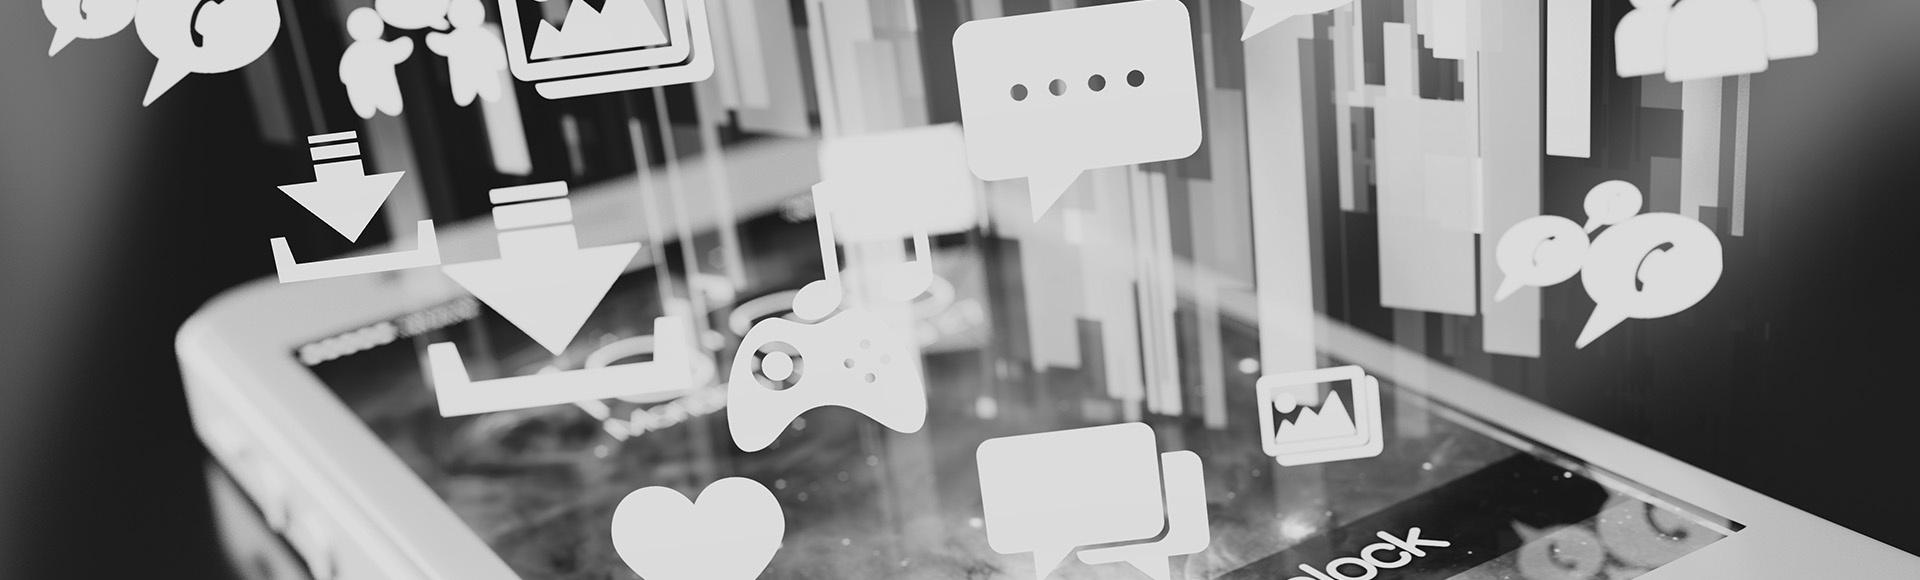 Social Media Mobile Application Services with Digital Nexa, UAE